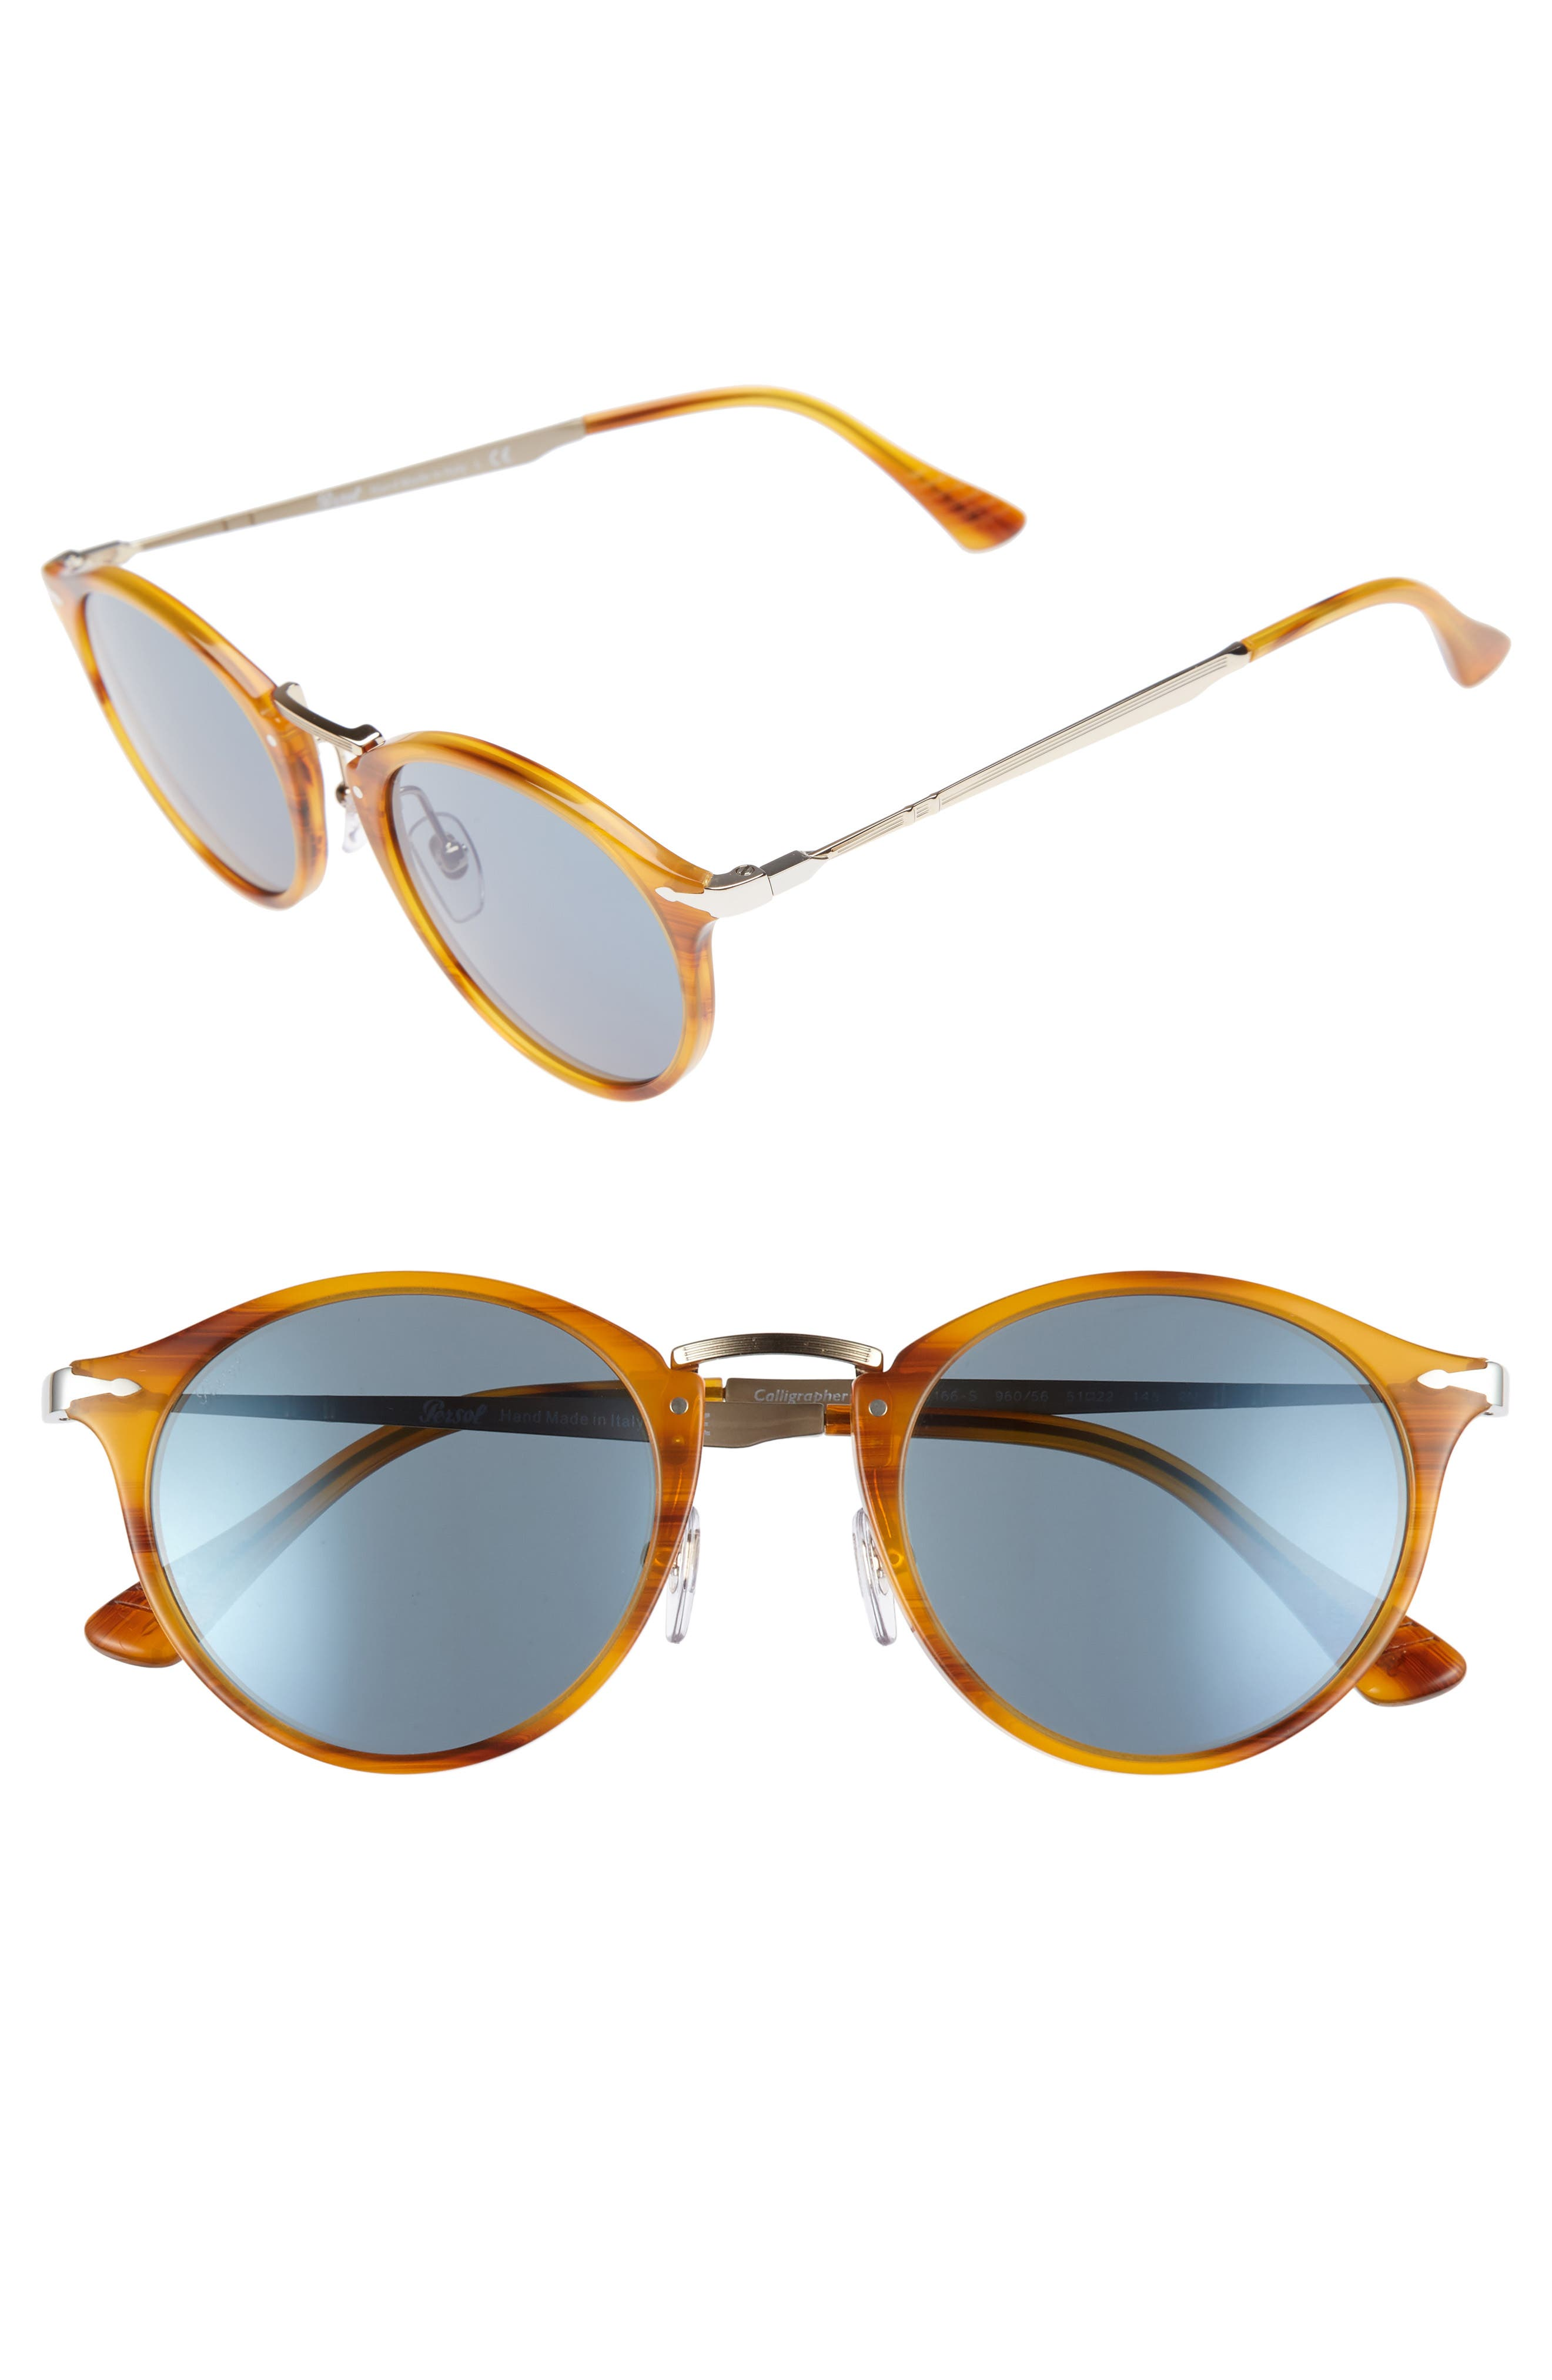 Persol Sartoria Typewriter 51mm Polarized Sunglasses